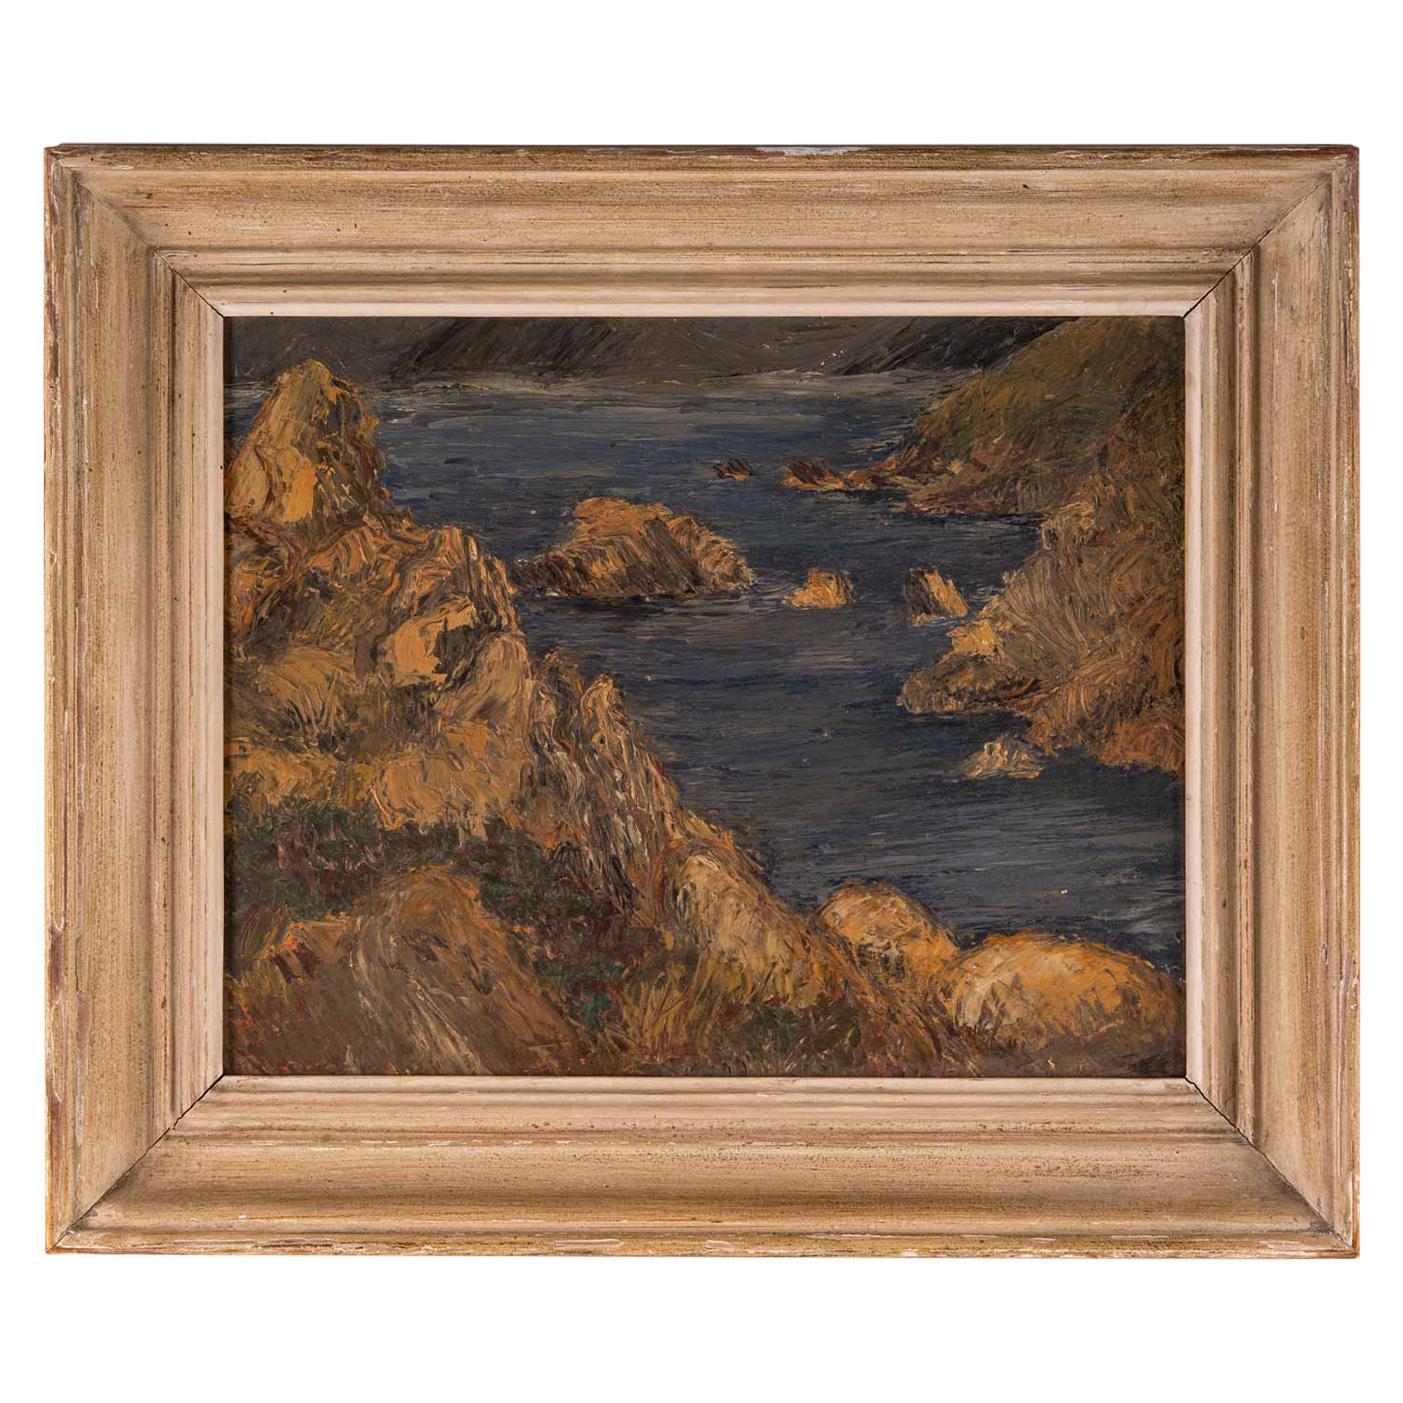 Landscape of the Cliffs, 20th Century